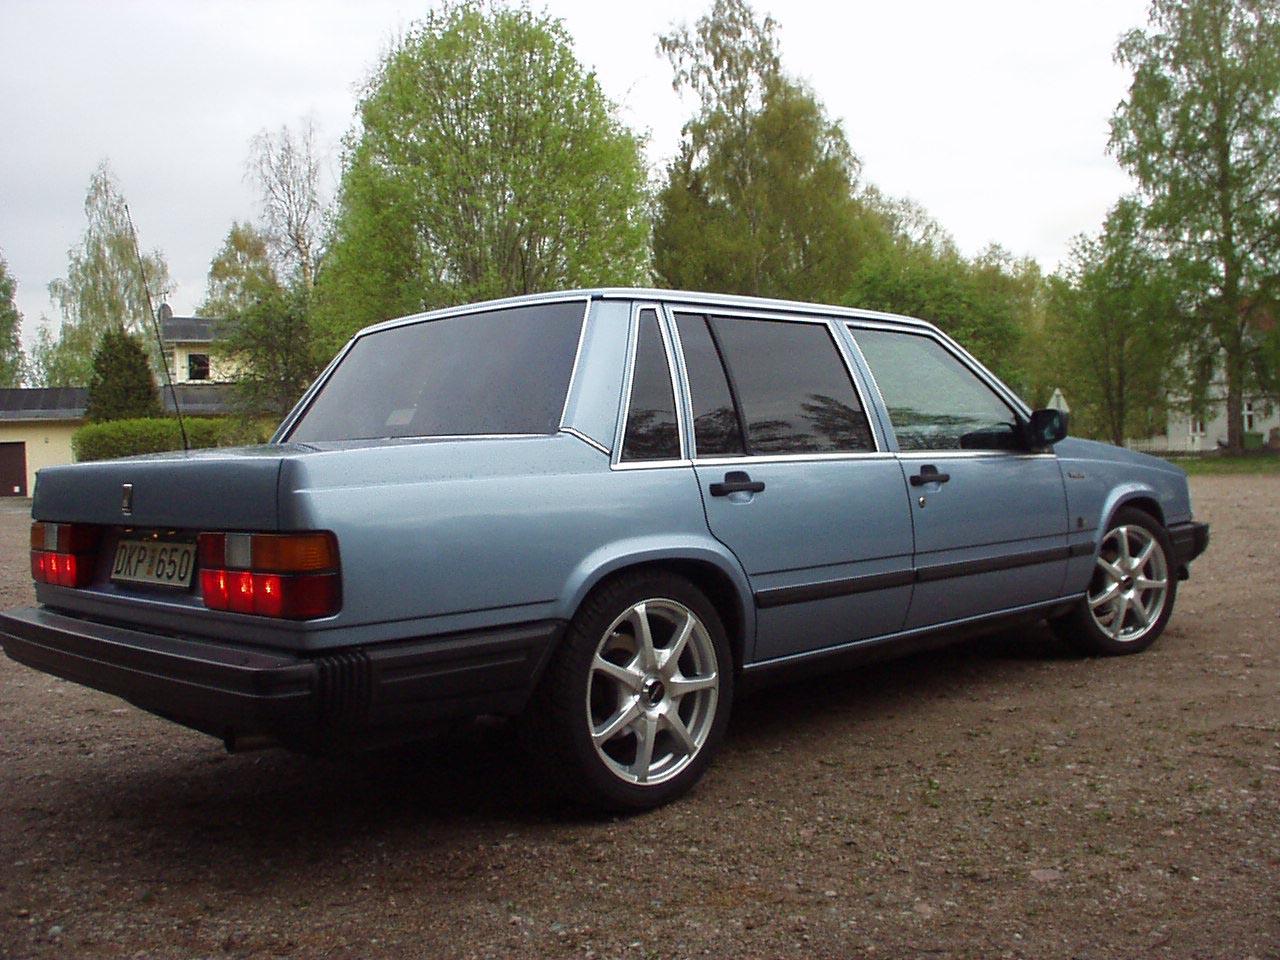 VOLVO 740 blue